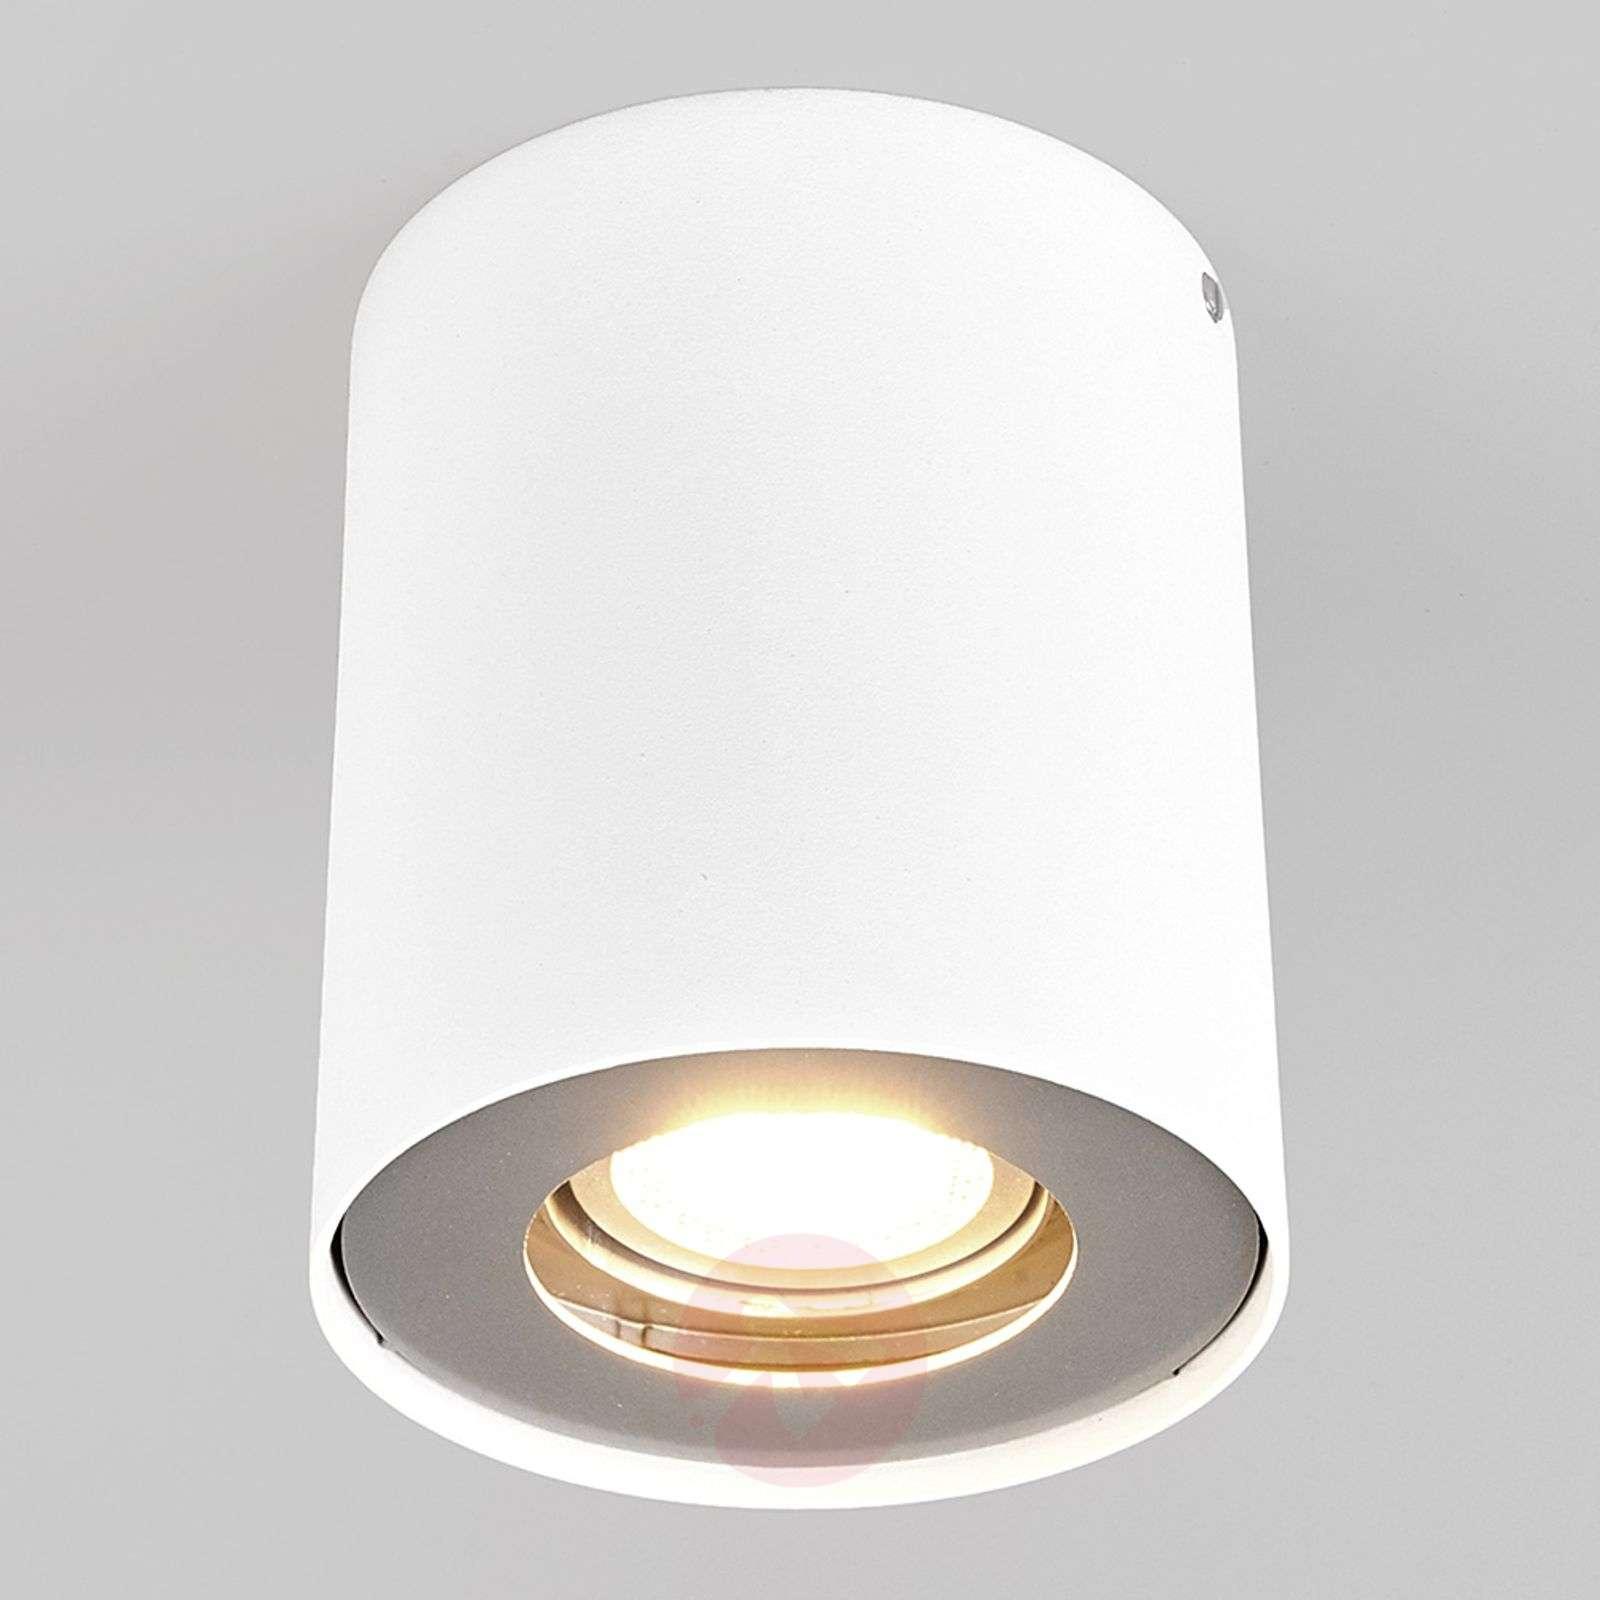 Gu10 led downlight giliano 1 bulb round white 9975001 01